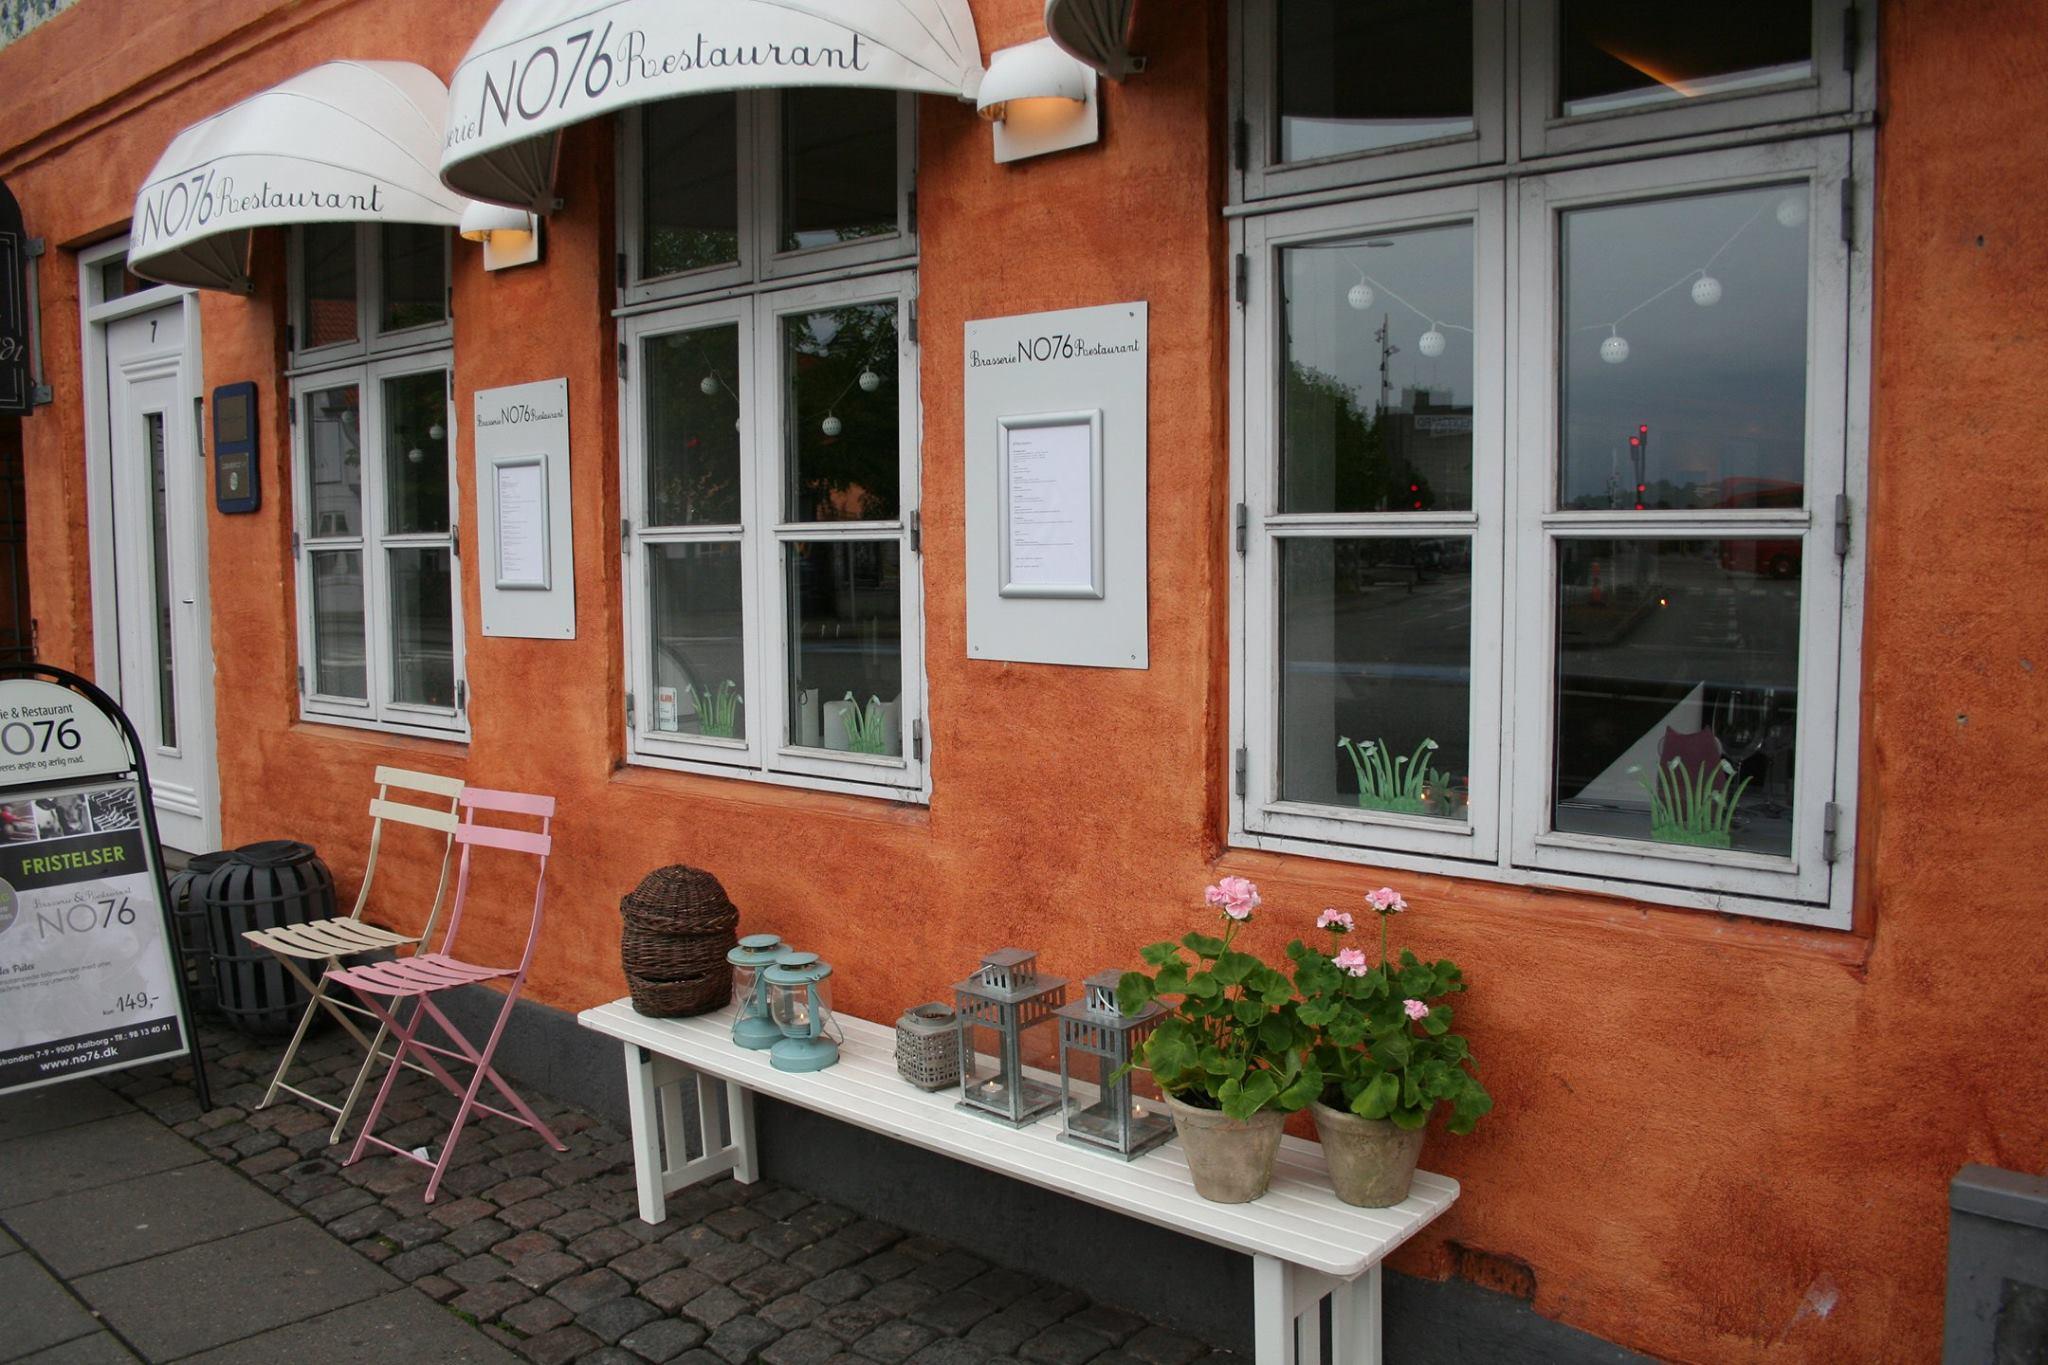 brasserie & restaurant no76 spis mad reserver menukort aalborg book bord ved stranden